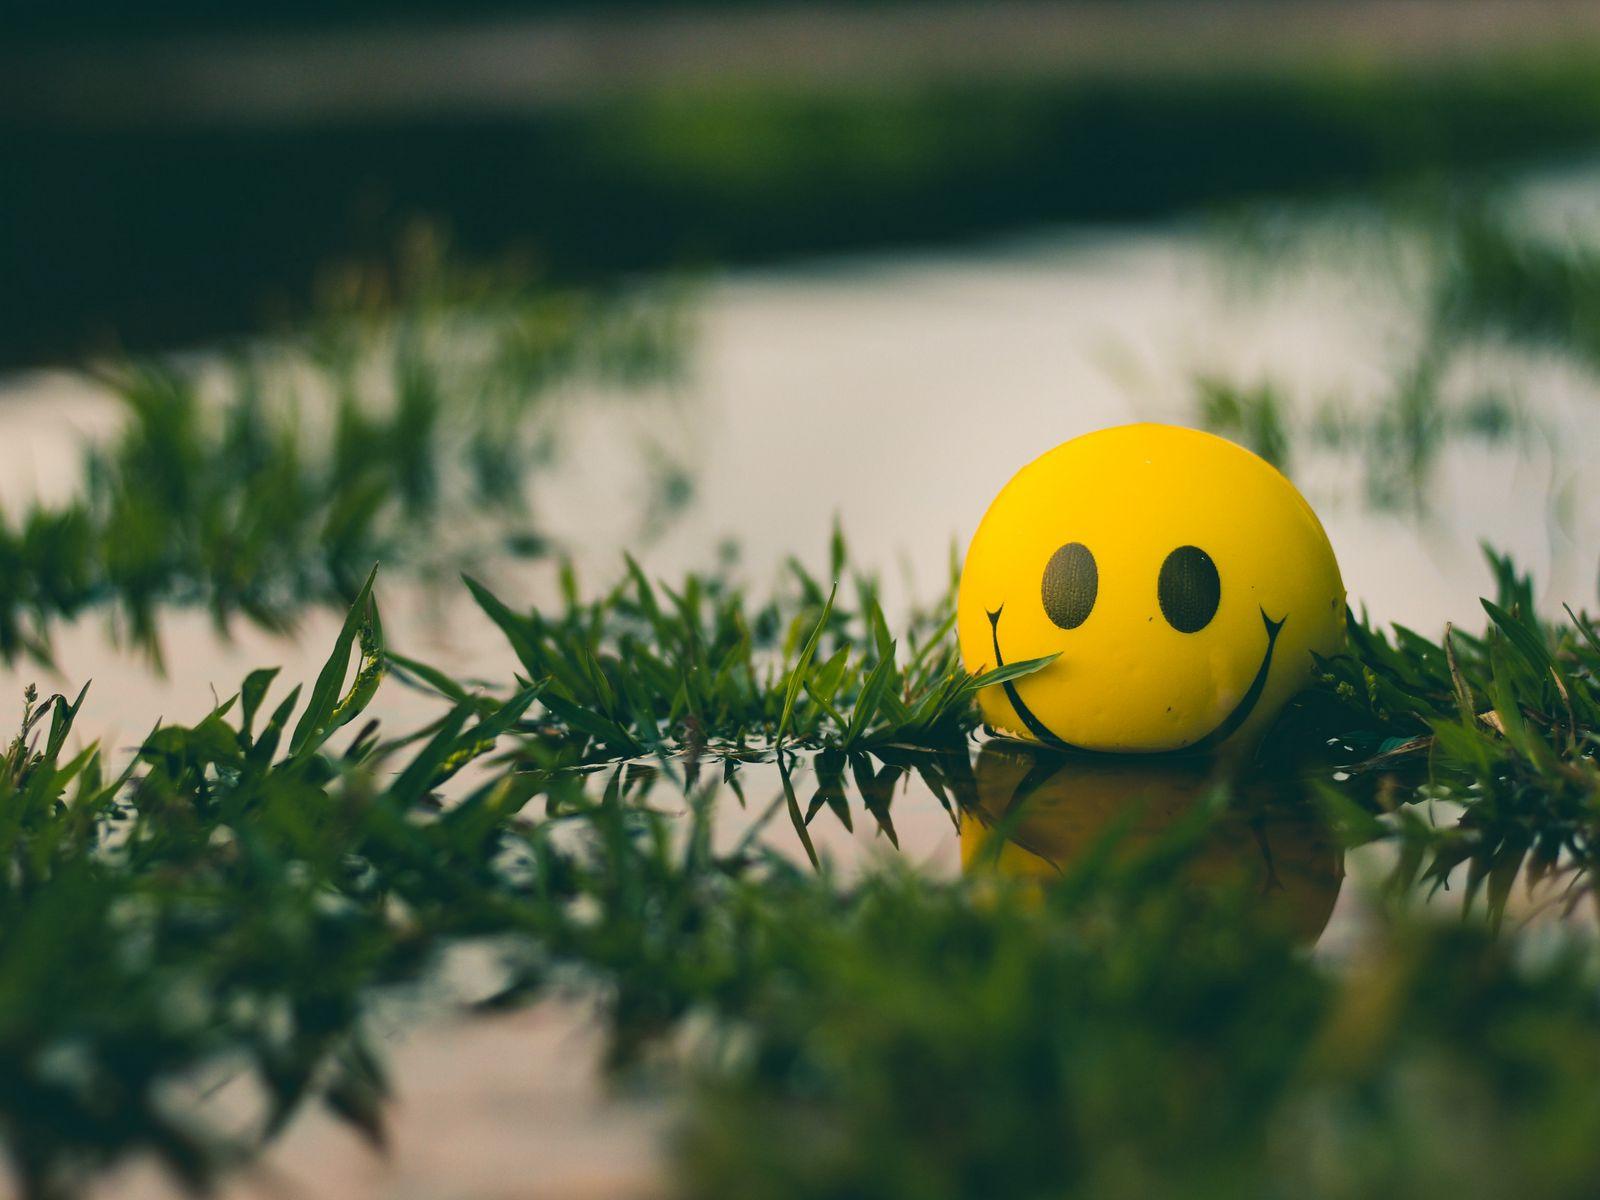 1600x1200 Wallpaper ball, smile, smiley, grass, water